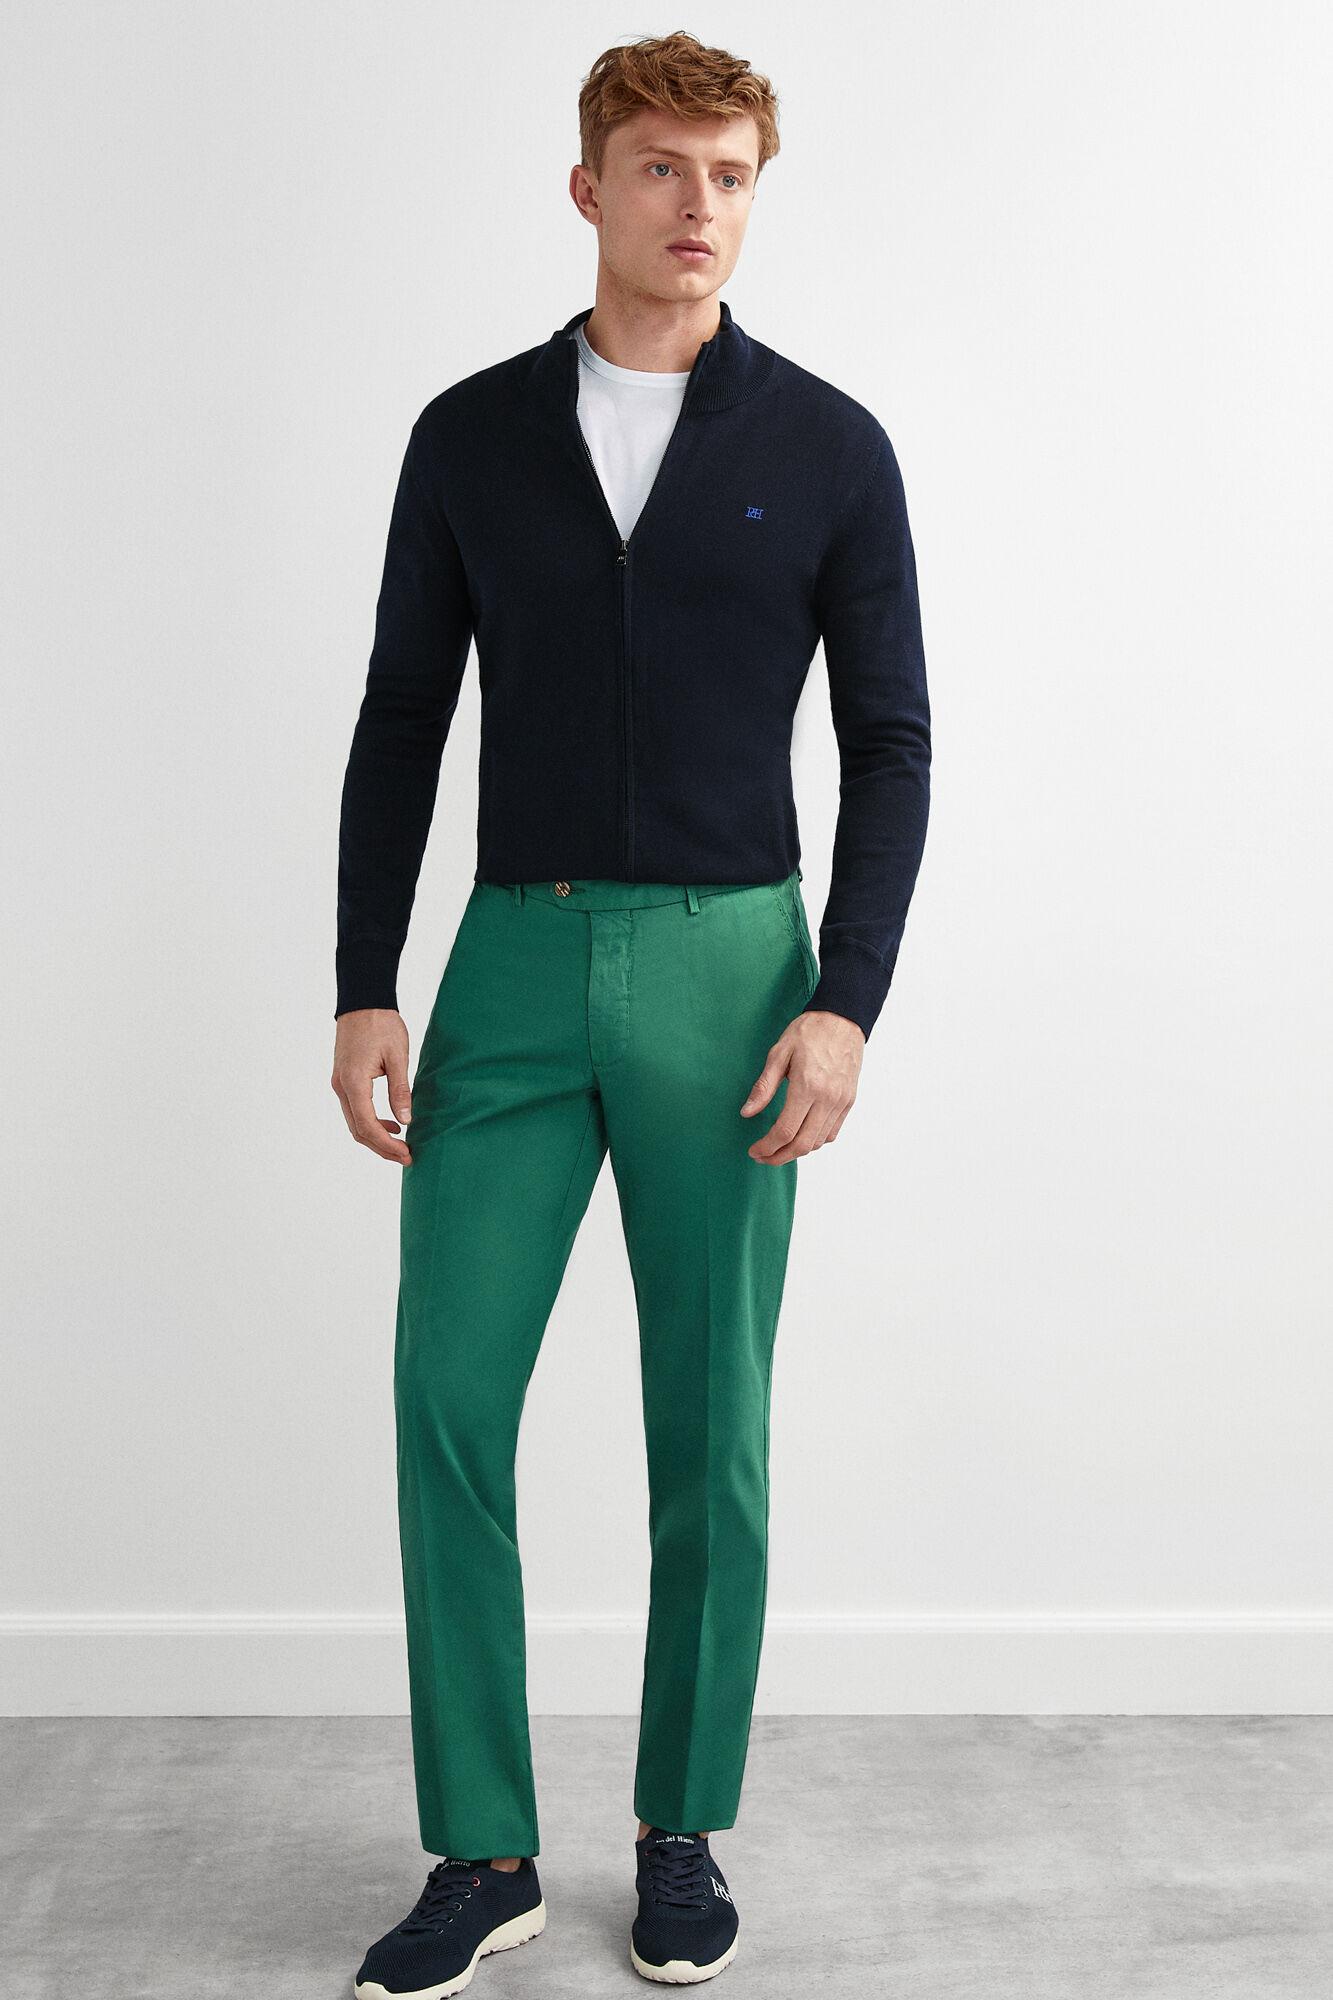 Regular Chinos Clasicos Pantalones Chinos Pantalones shdxrCtQ